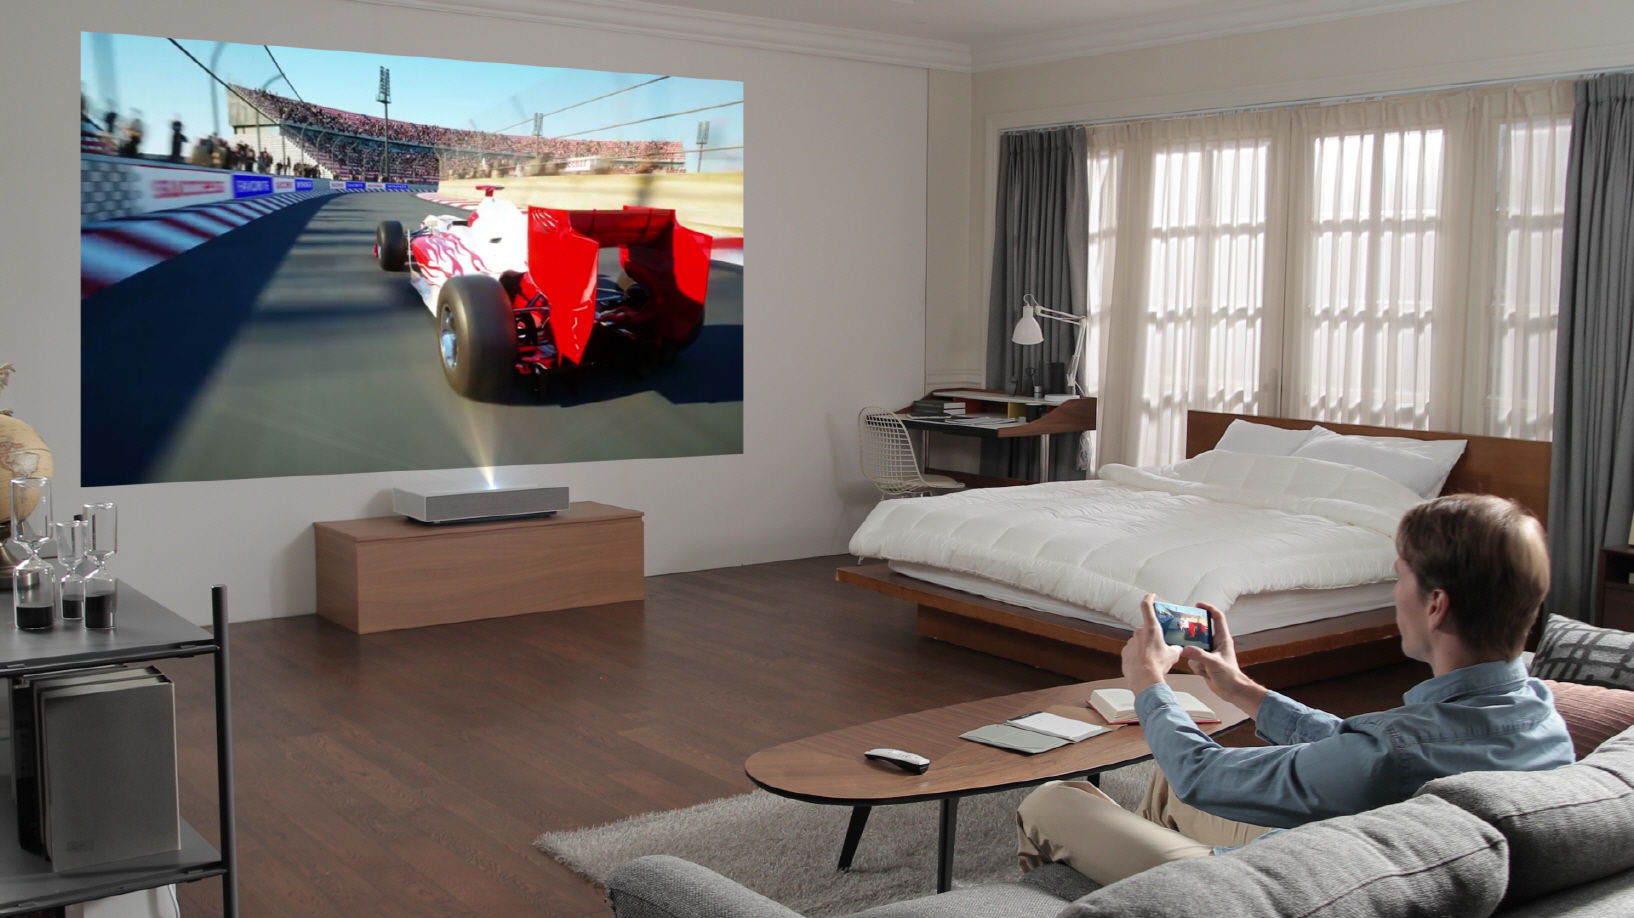 LG Unveils 8K TVs, Rollable OLED TVs, 4K Projectors, Ultra-Wide